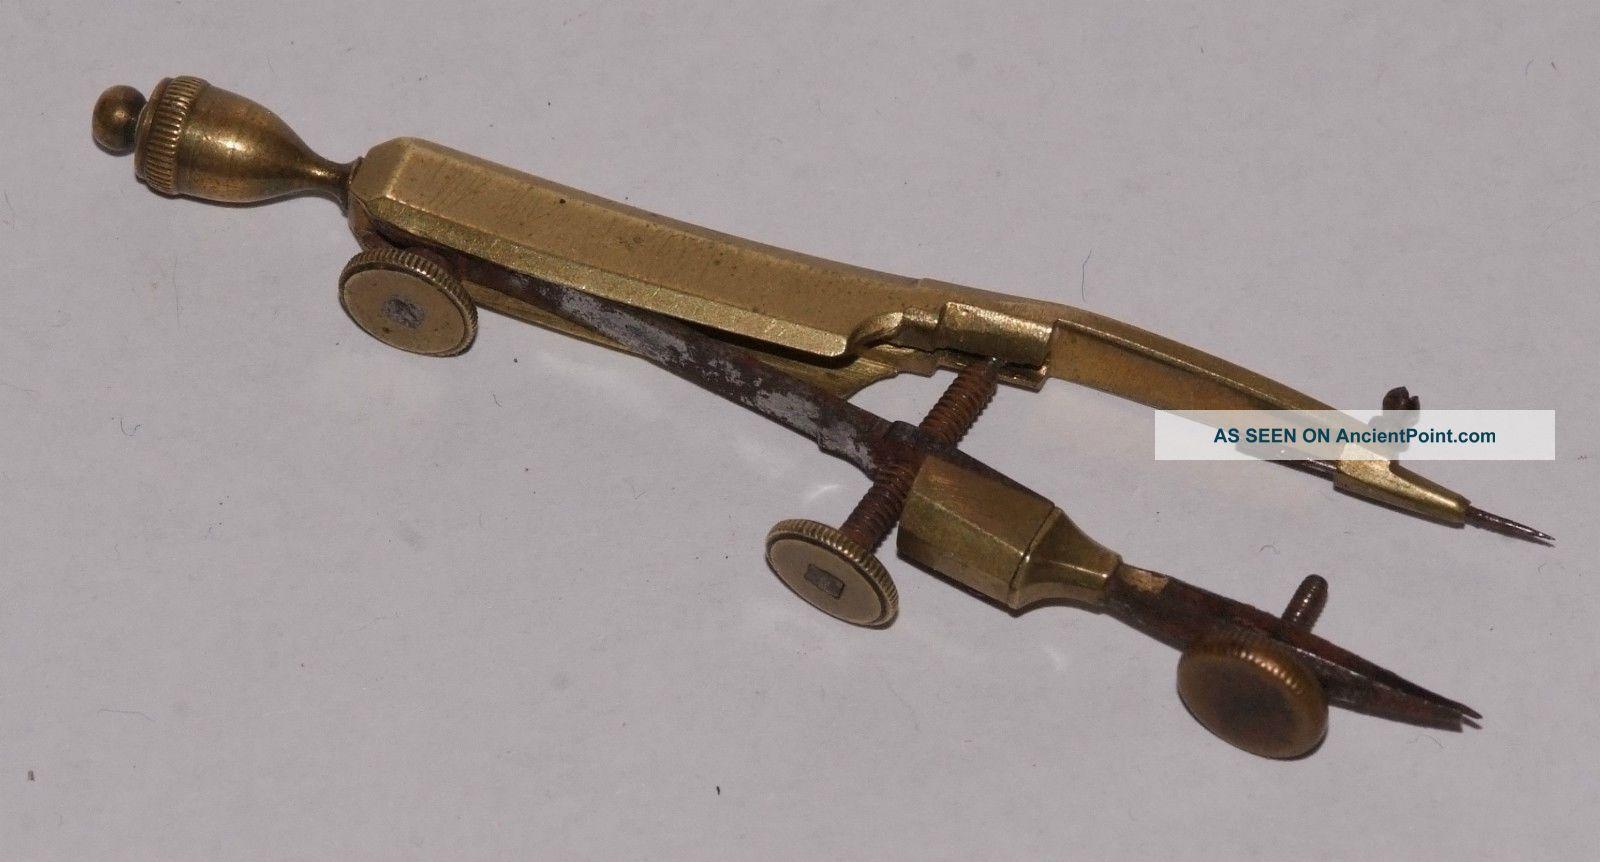 antique astronomy equipment - photo #33